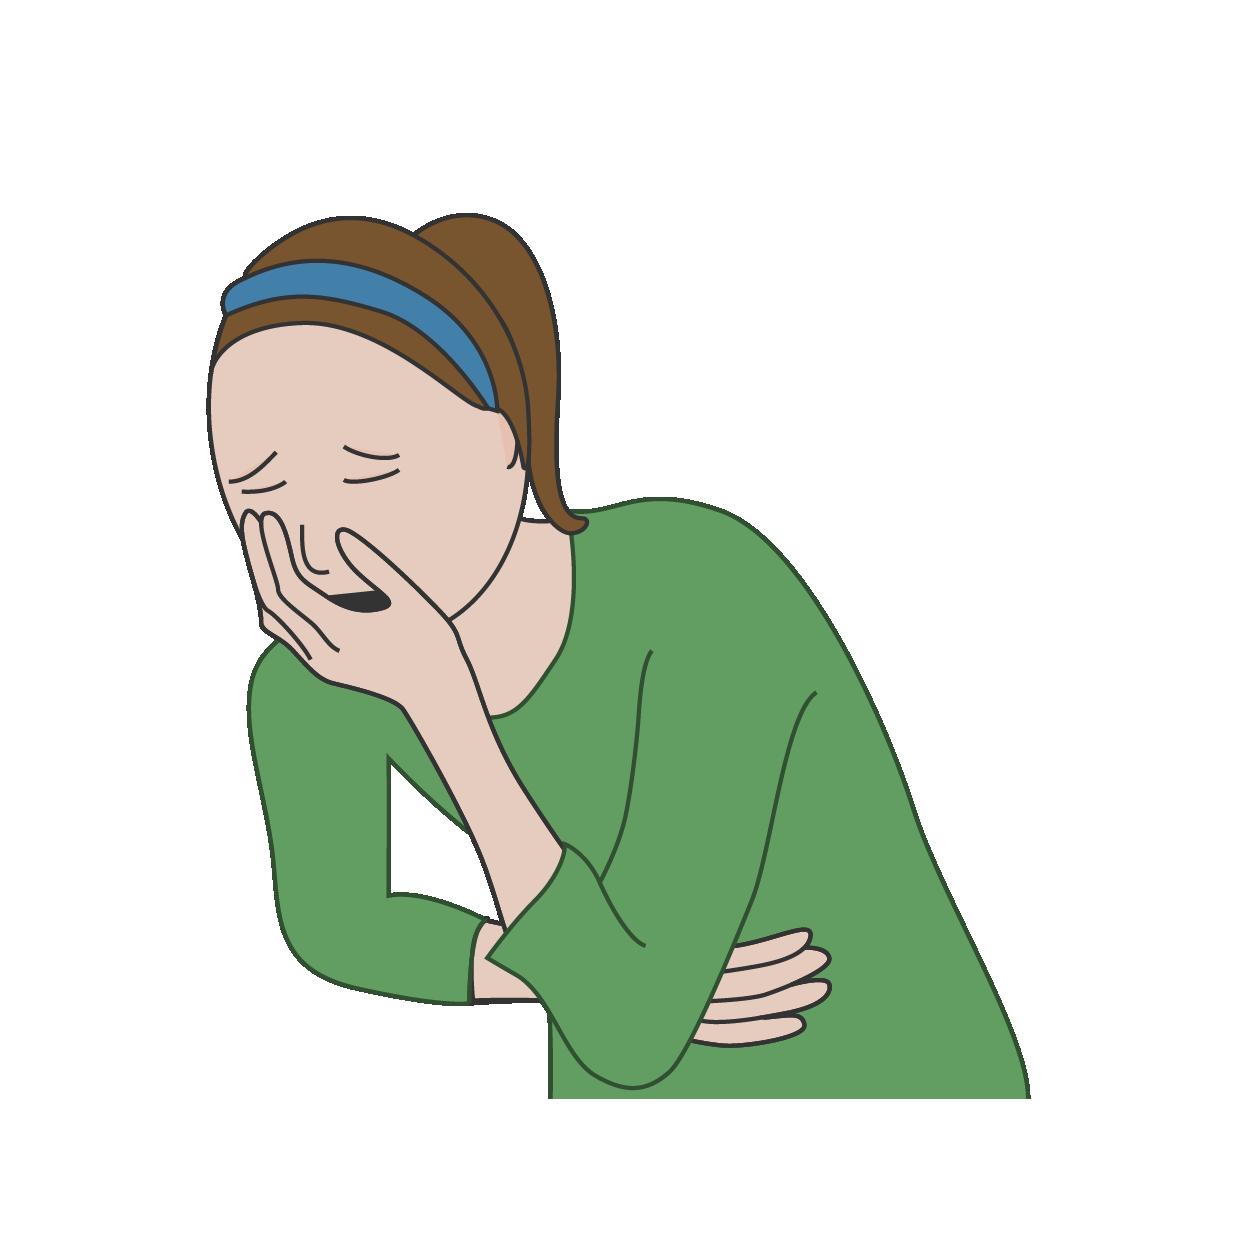 Cyclosporine nausea vomiting discomfort. Stomach clipart stomach flu